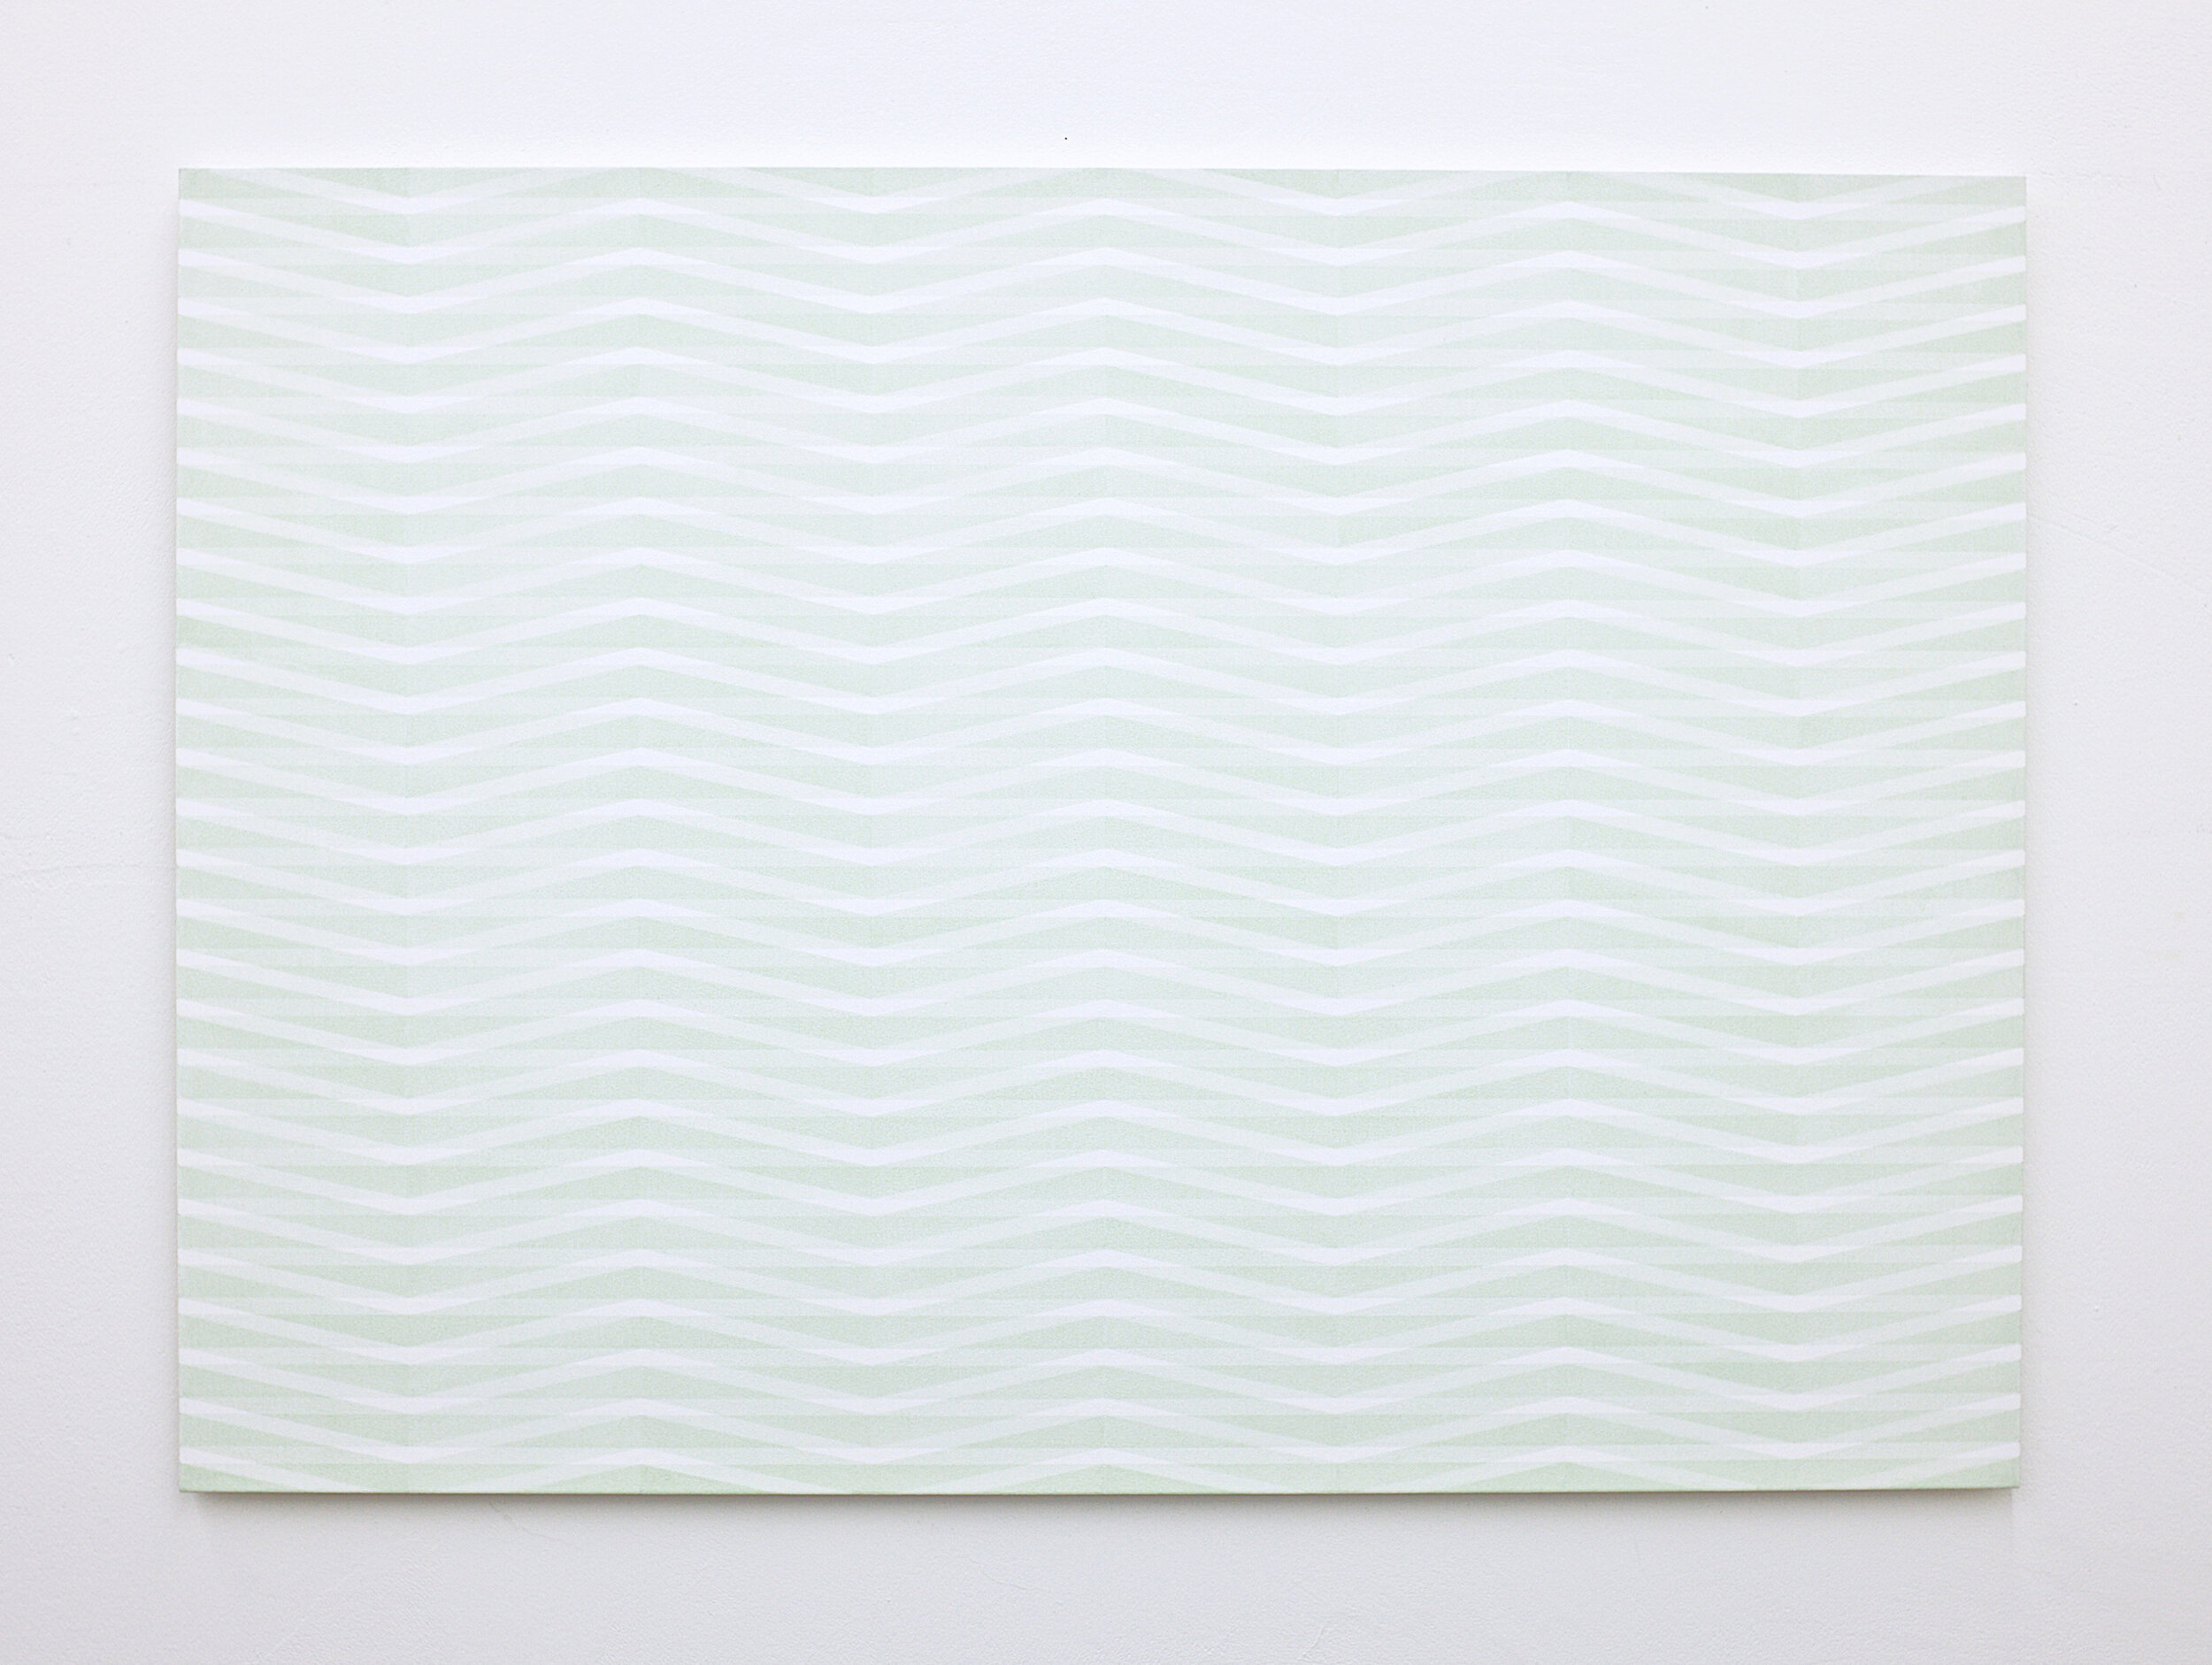 bild nr. 09/2019 - 100 x 140cm - acryl auf baumwolle/alu